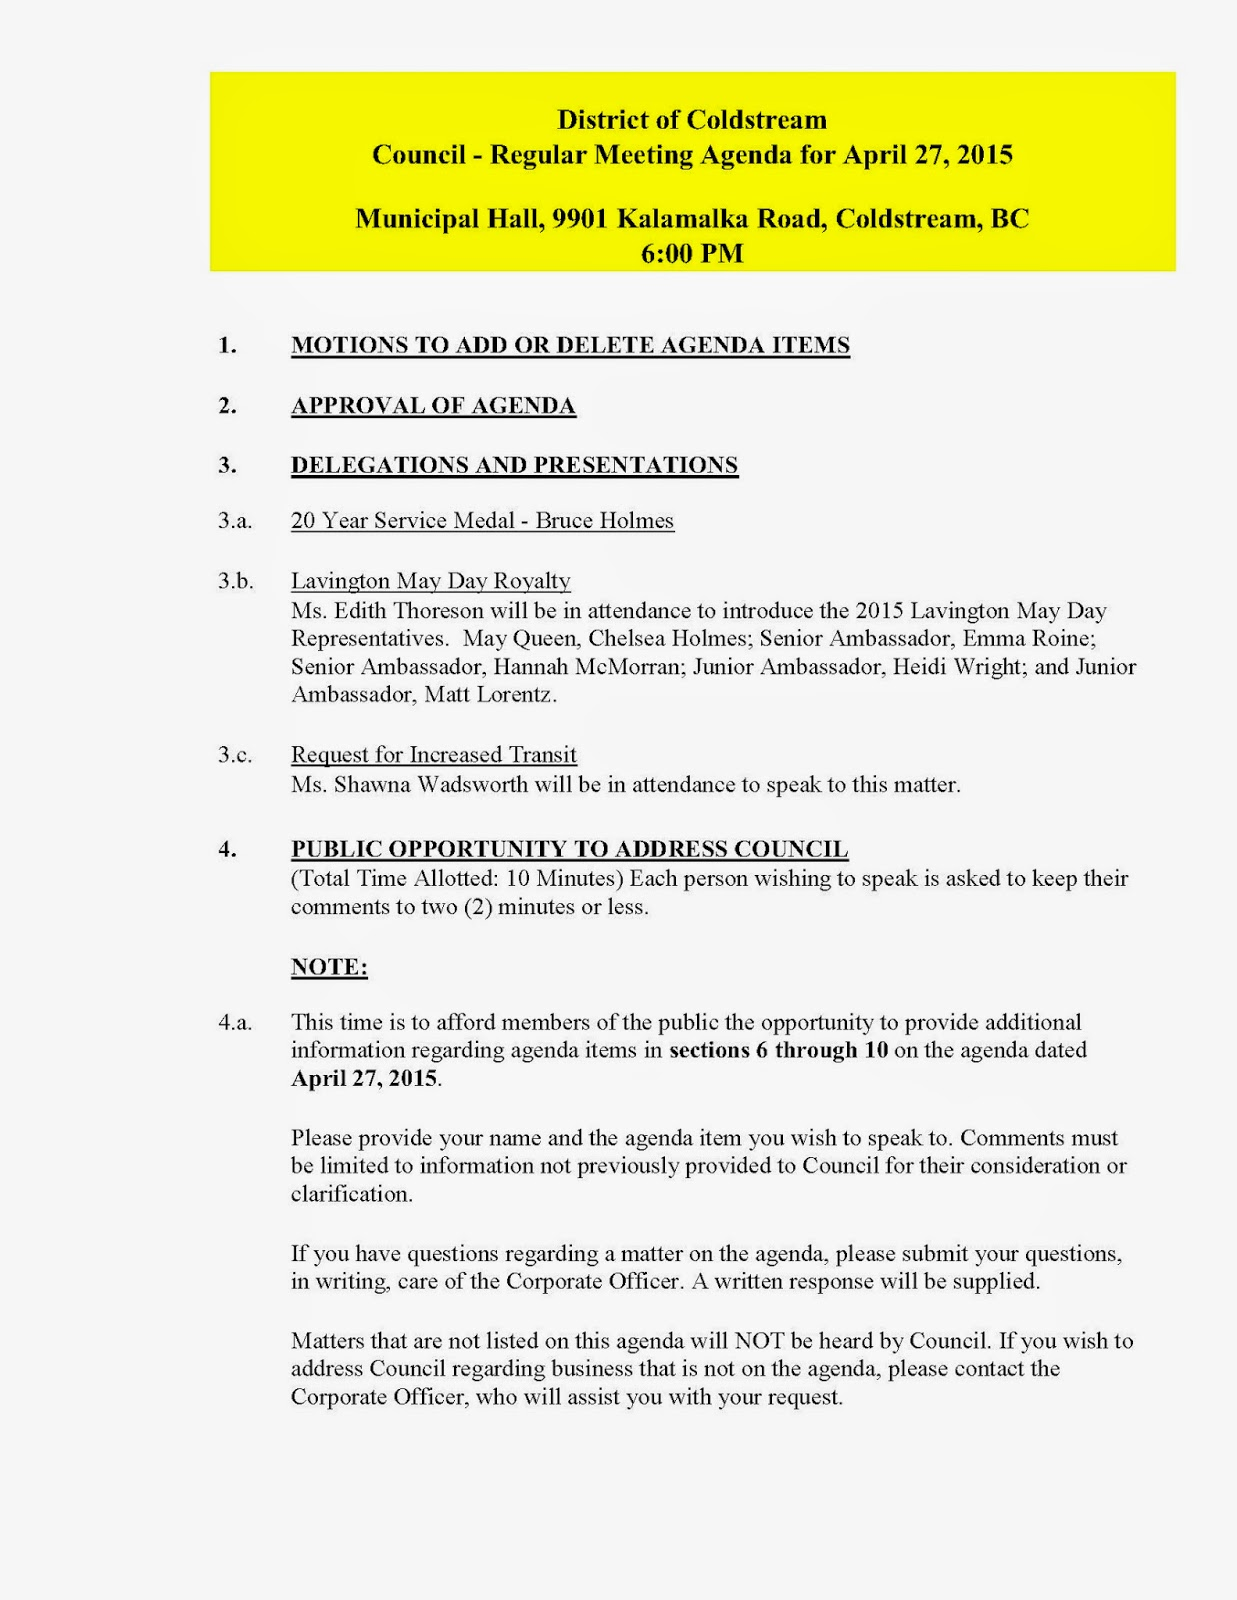 http://coldstream.civicweb.net/Documents/DocumentList.aspx?ID=22235